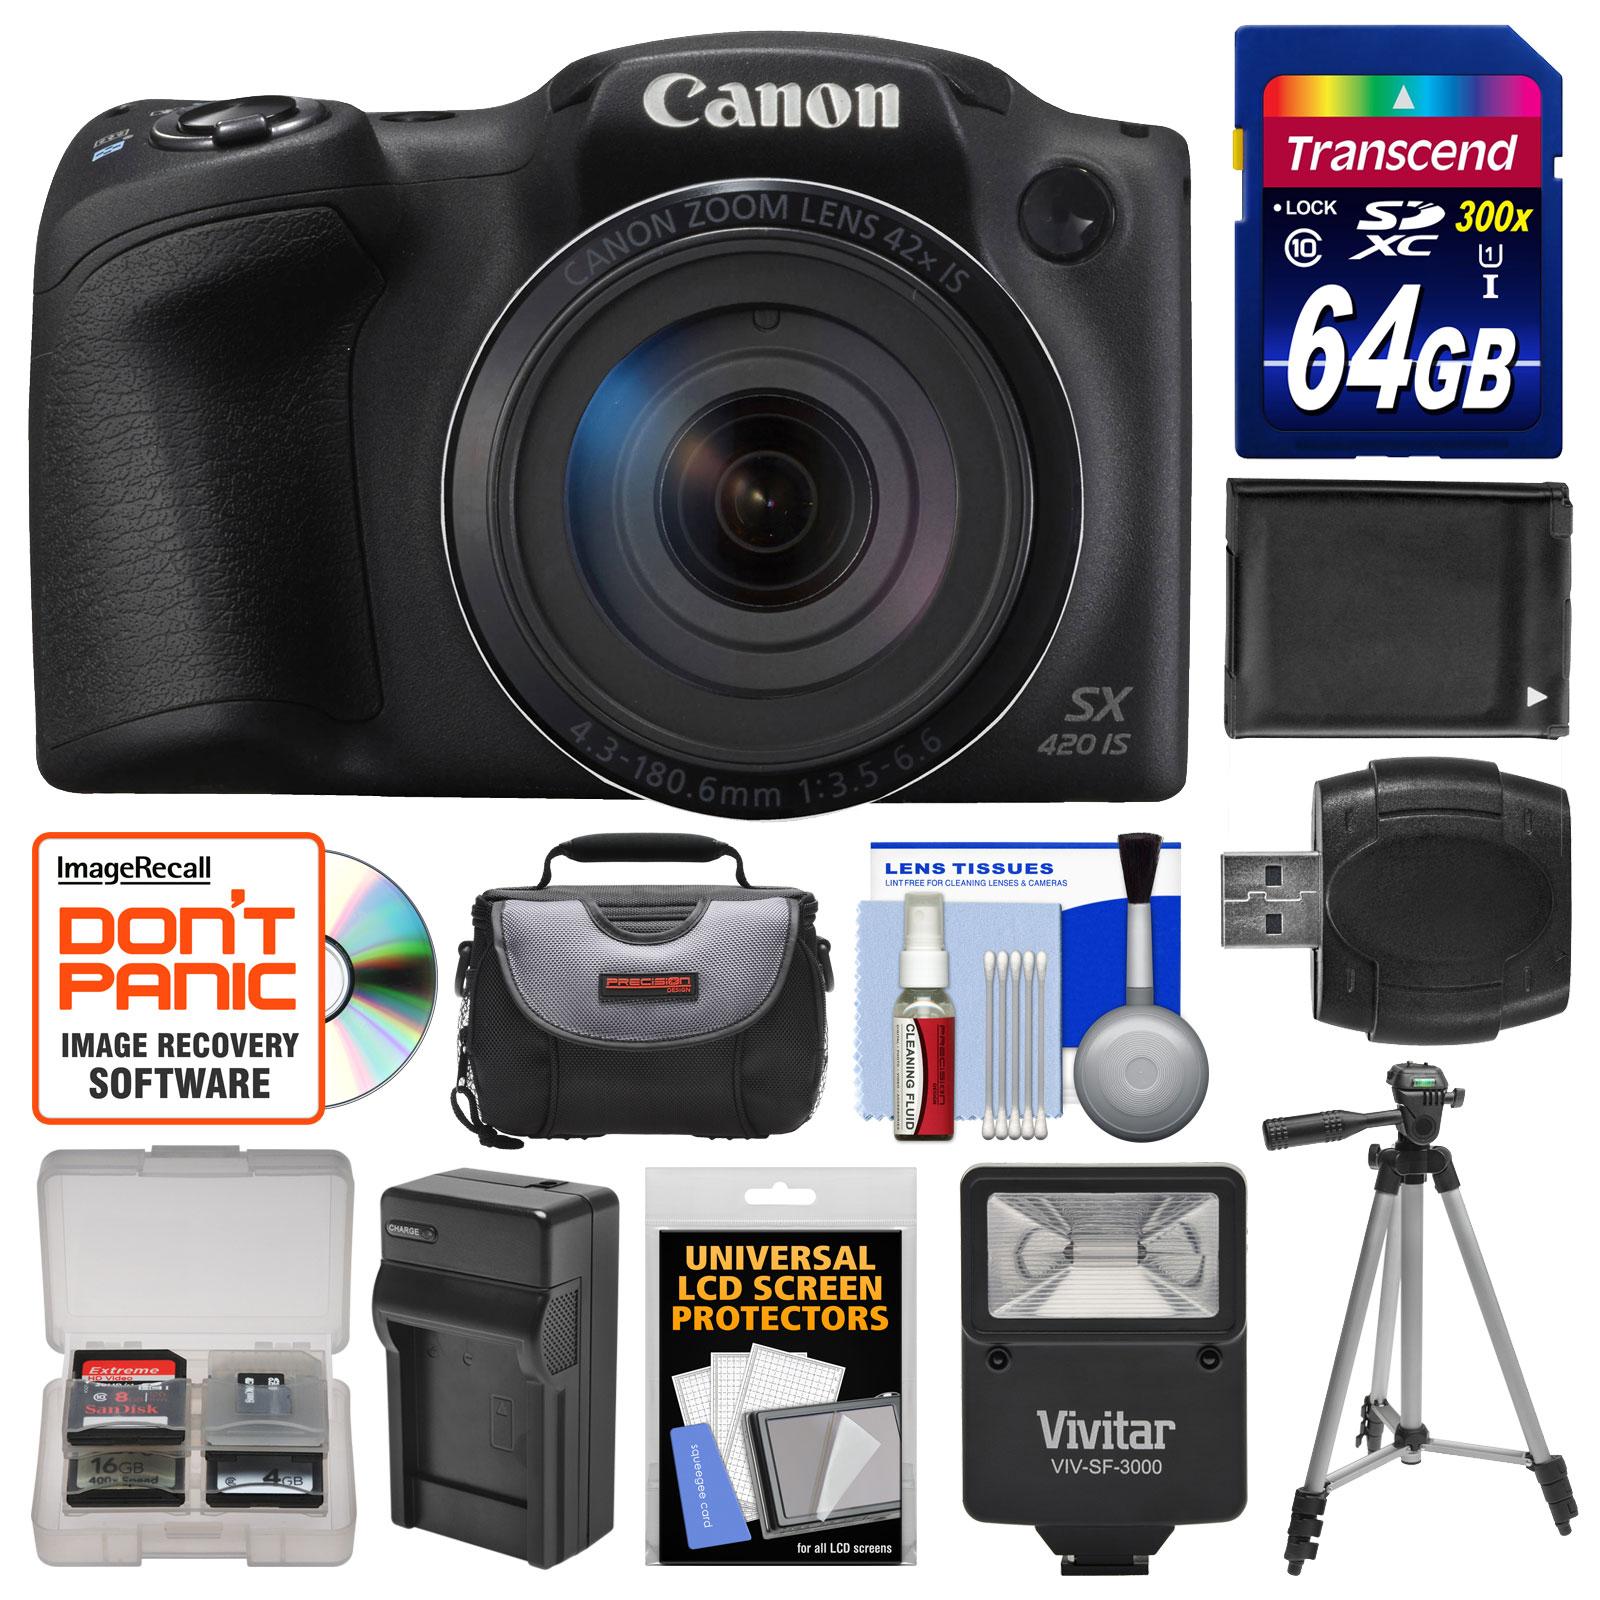 Canon PowerShot SX420 IS Wi-Fi Digital Camera (Black) wit...